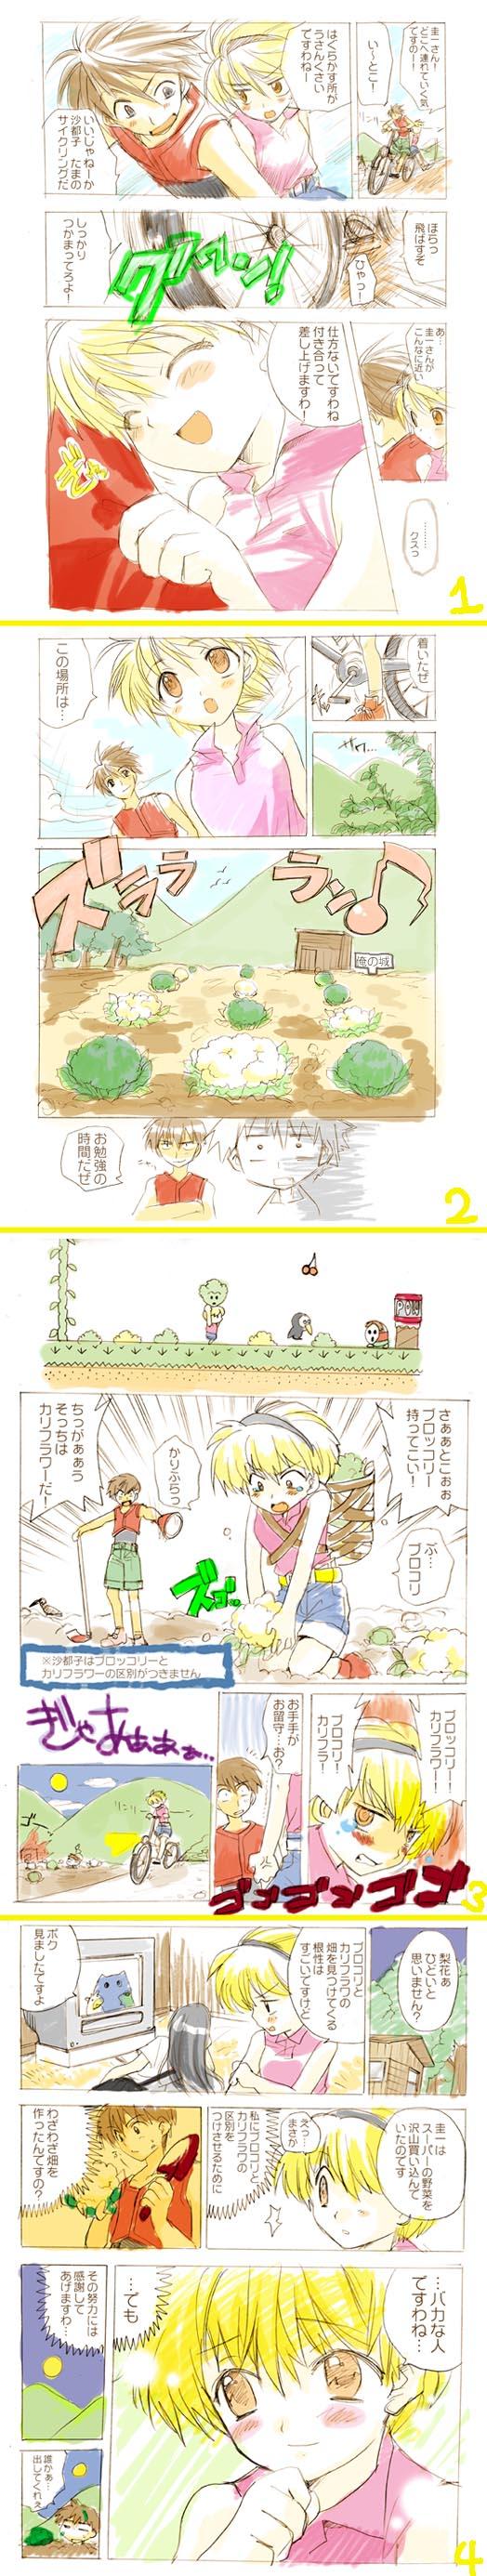 absurdres cabbage cherry comic crossover food fruit furude_rika highres higurashi_no_naku_koro_ni houjou_satoko long_image maebara_keiichi mario_(series) nintendo pow_block shy_guy super_mario_bros. super_mario_bros._2 tall_image translation_request tweeter vegetable